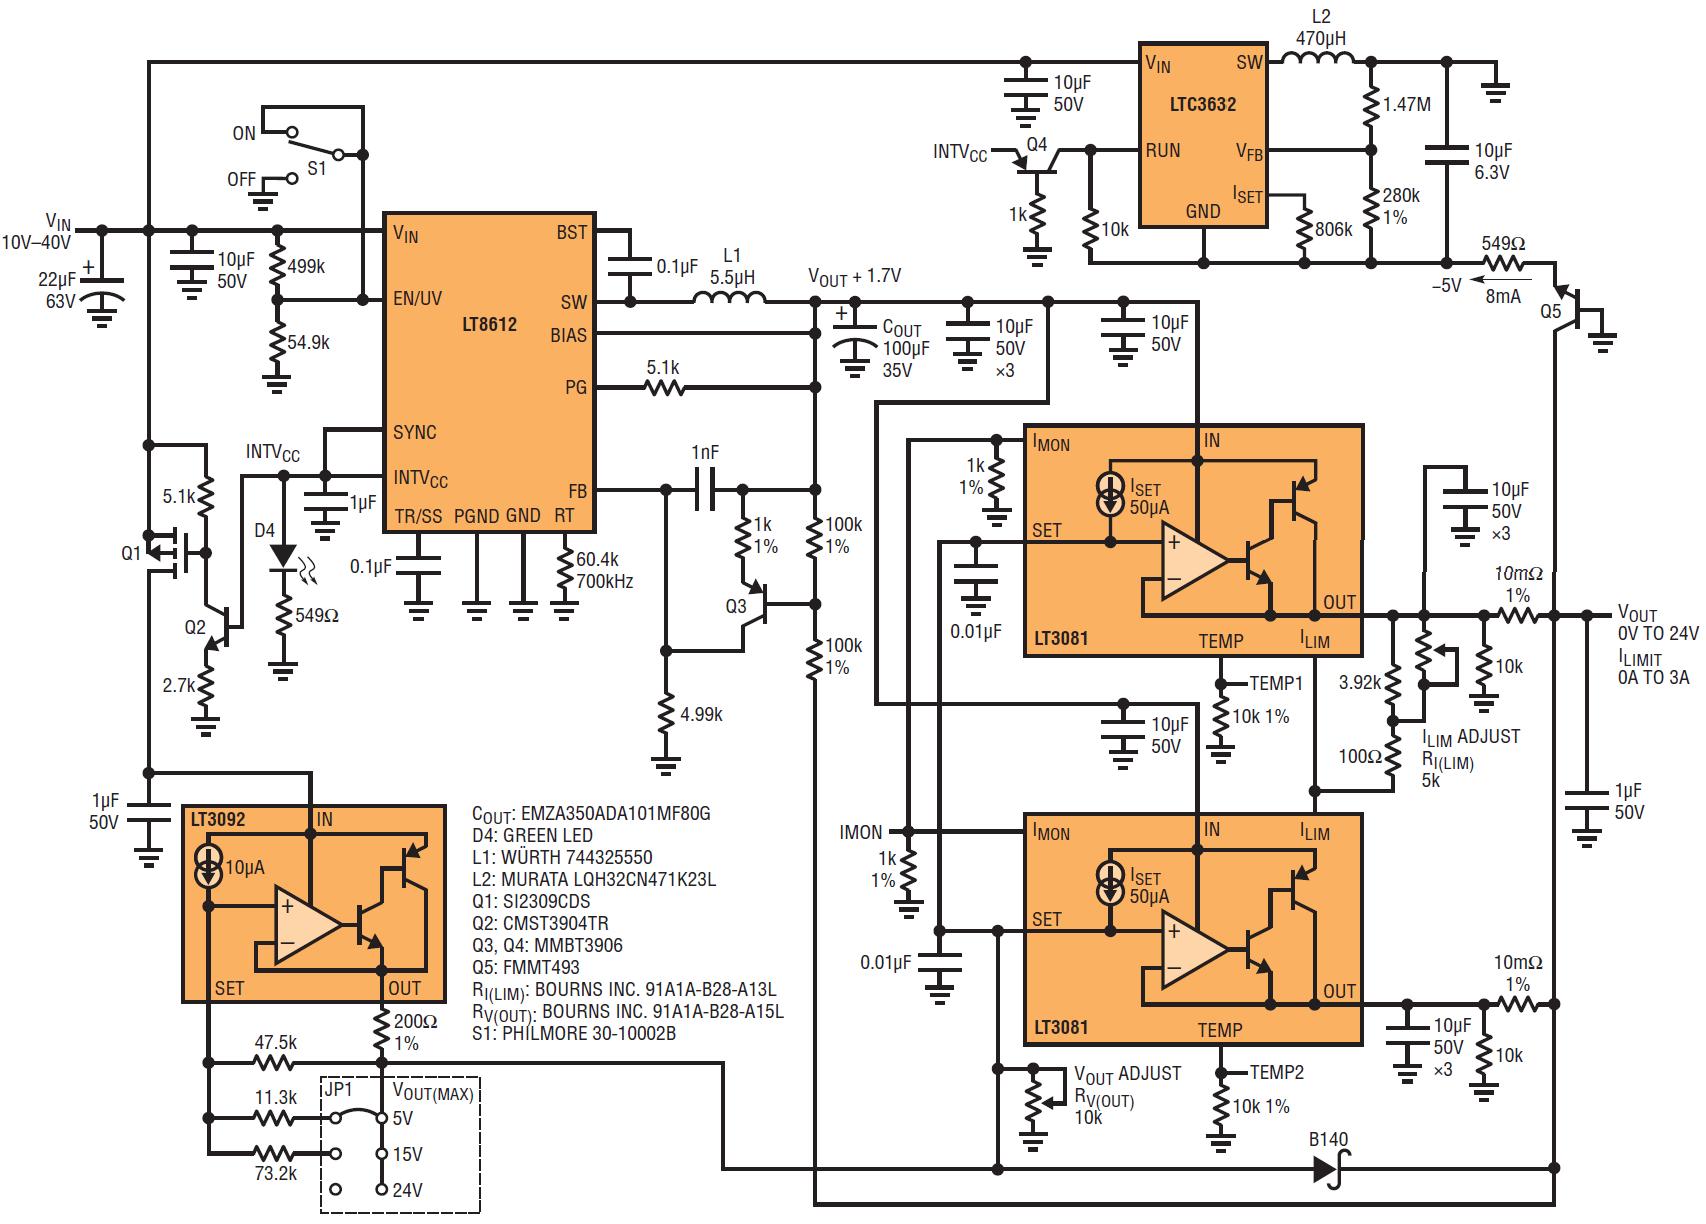 12v 5a dc power supply circuit diagram [ 1706 x 1224 Pixel ]